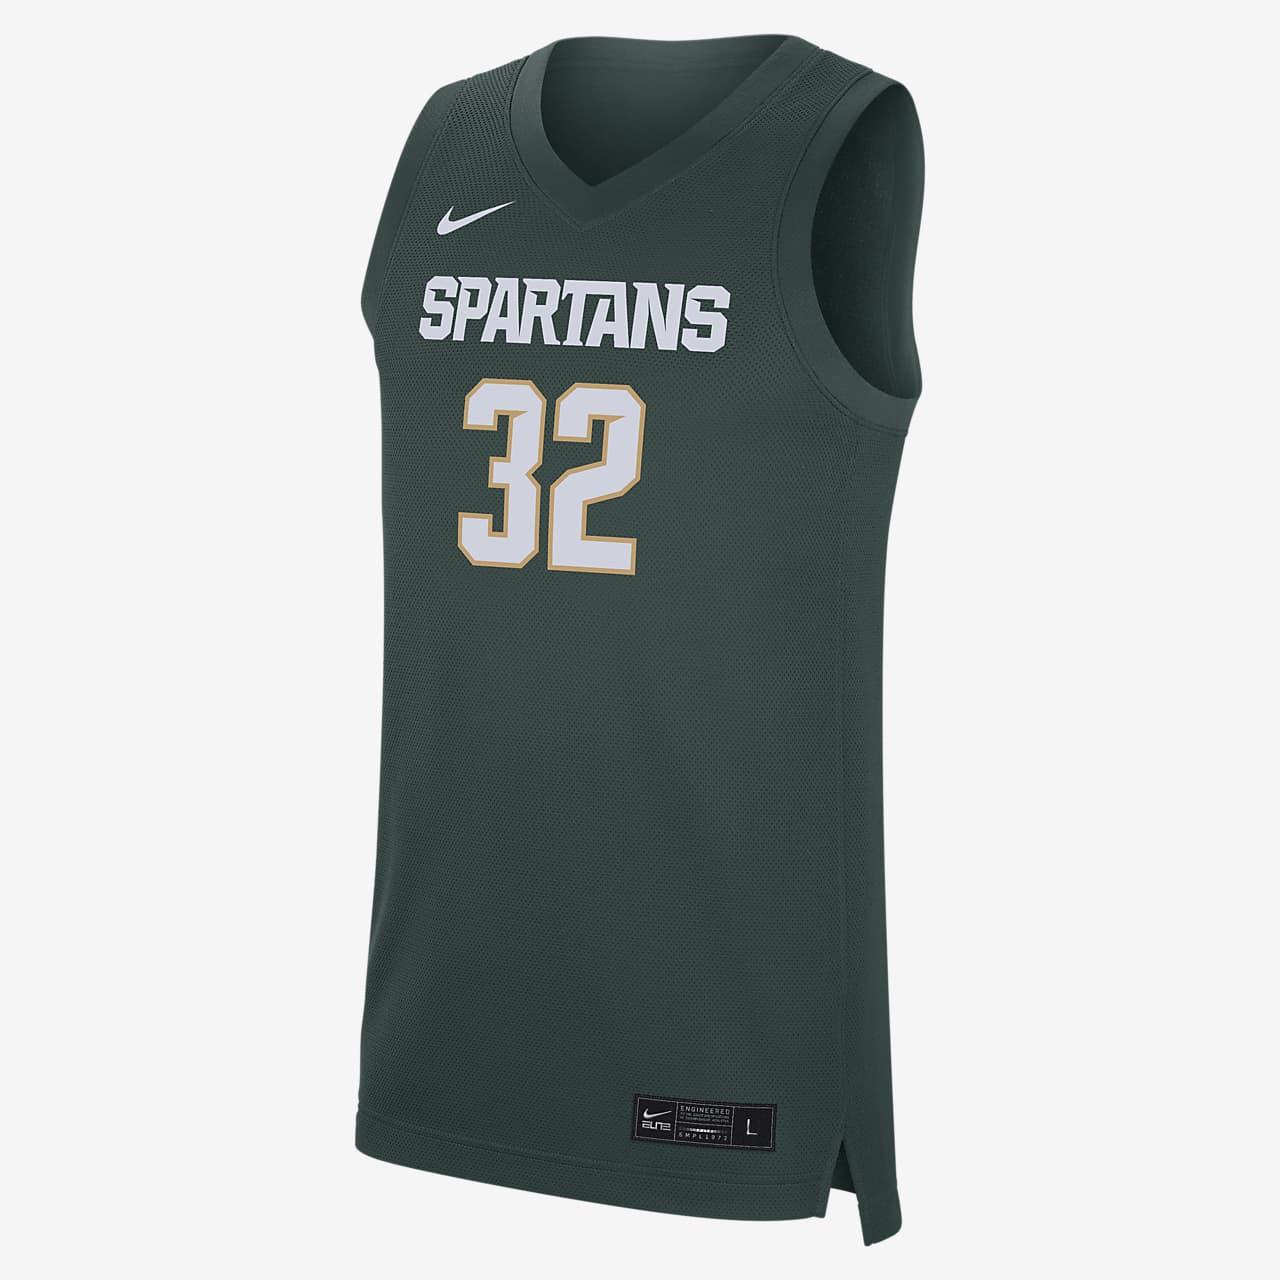 Nike College Replica (Michigan State) Men's Basketball Jersey